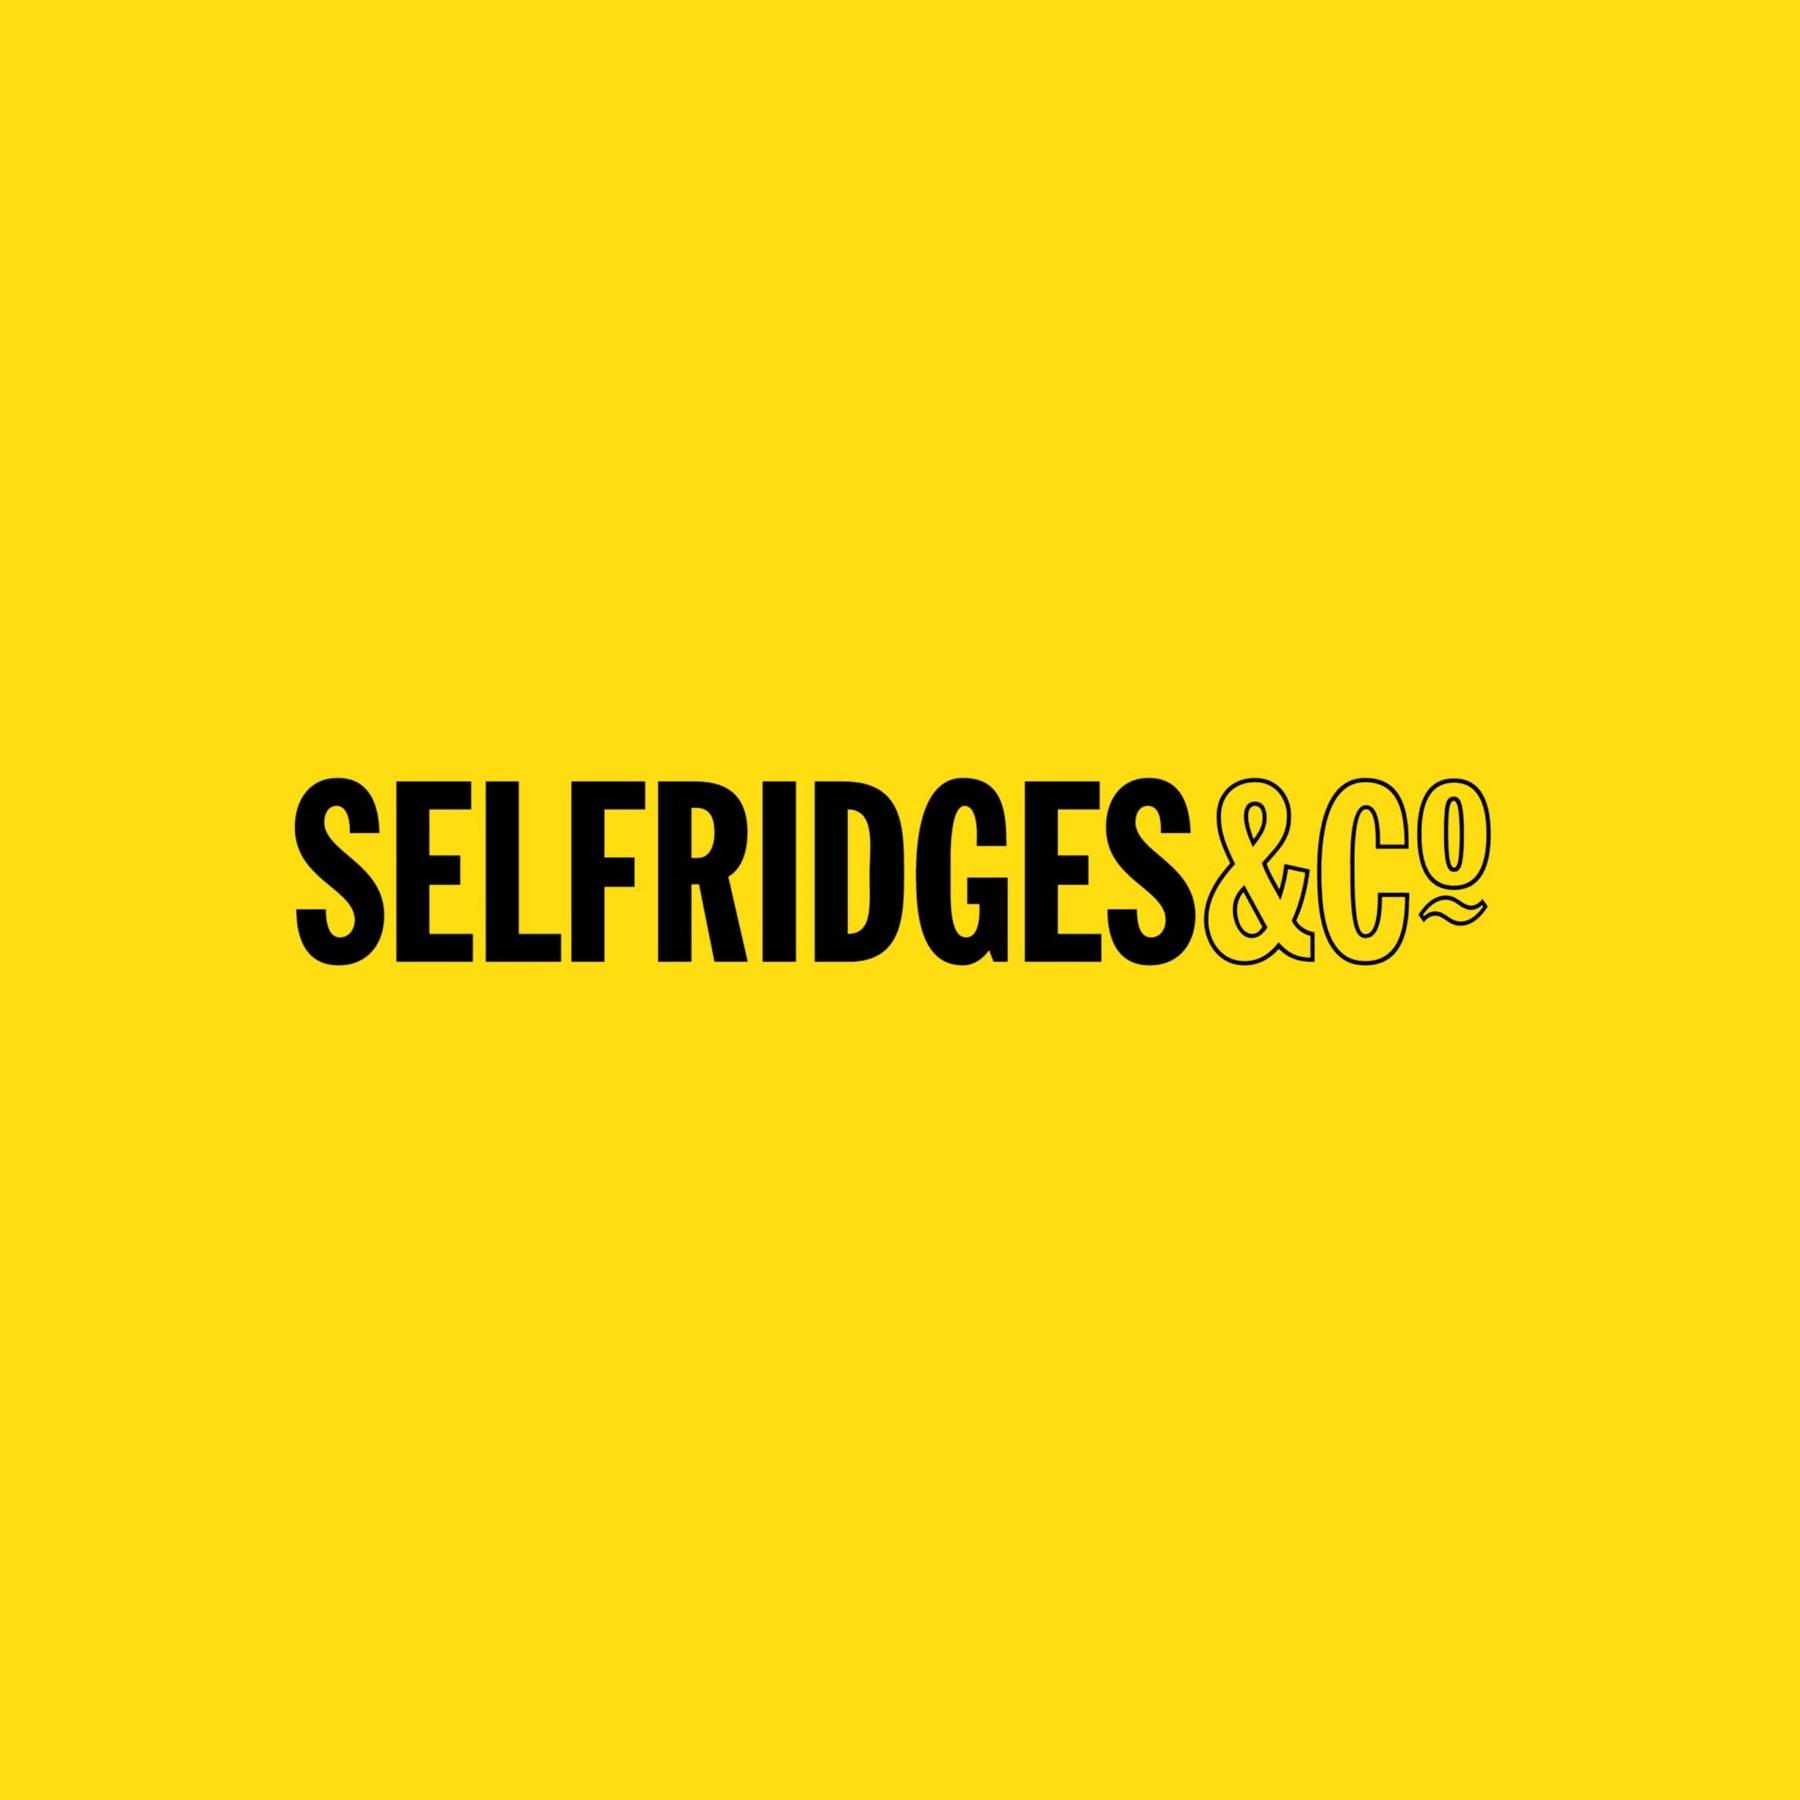 Selfridges官网圣诞Sale正式开始,热门链接已经准备好,全球直邮,包括中国